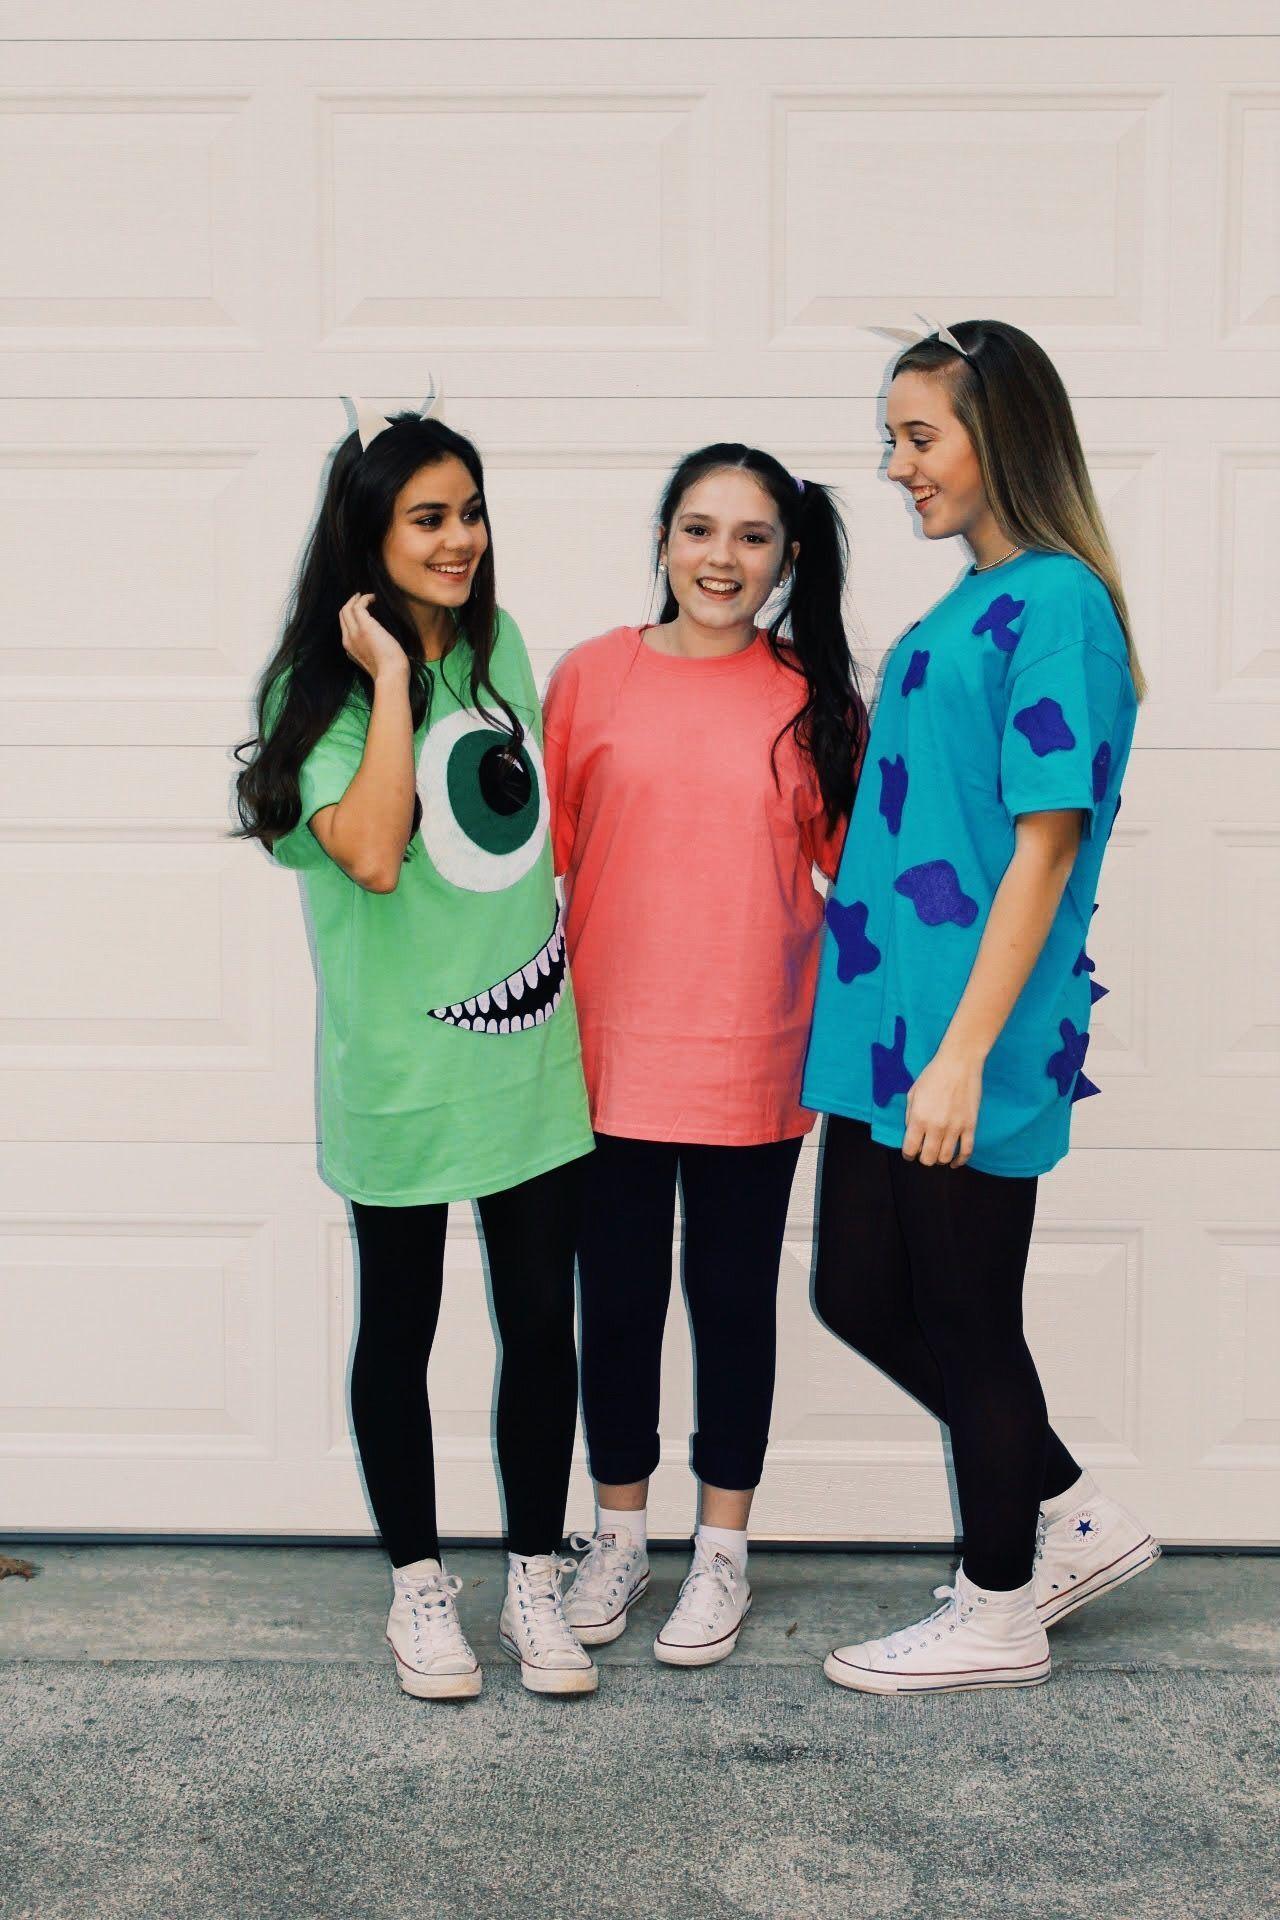 Trio Halloween Costumes 2020 grouphalloweencostumes #bffhalloweencostumes